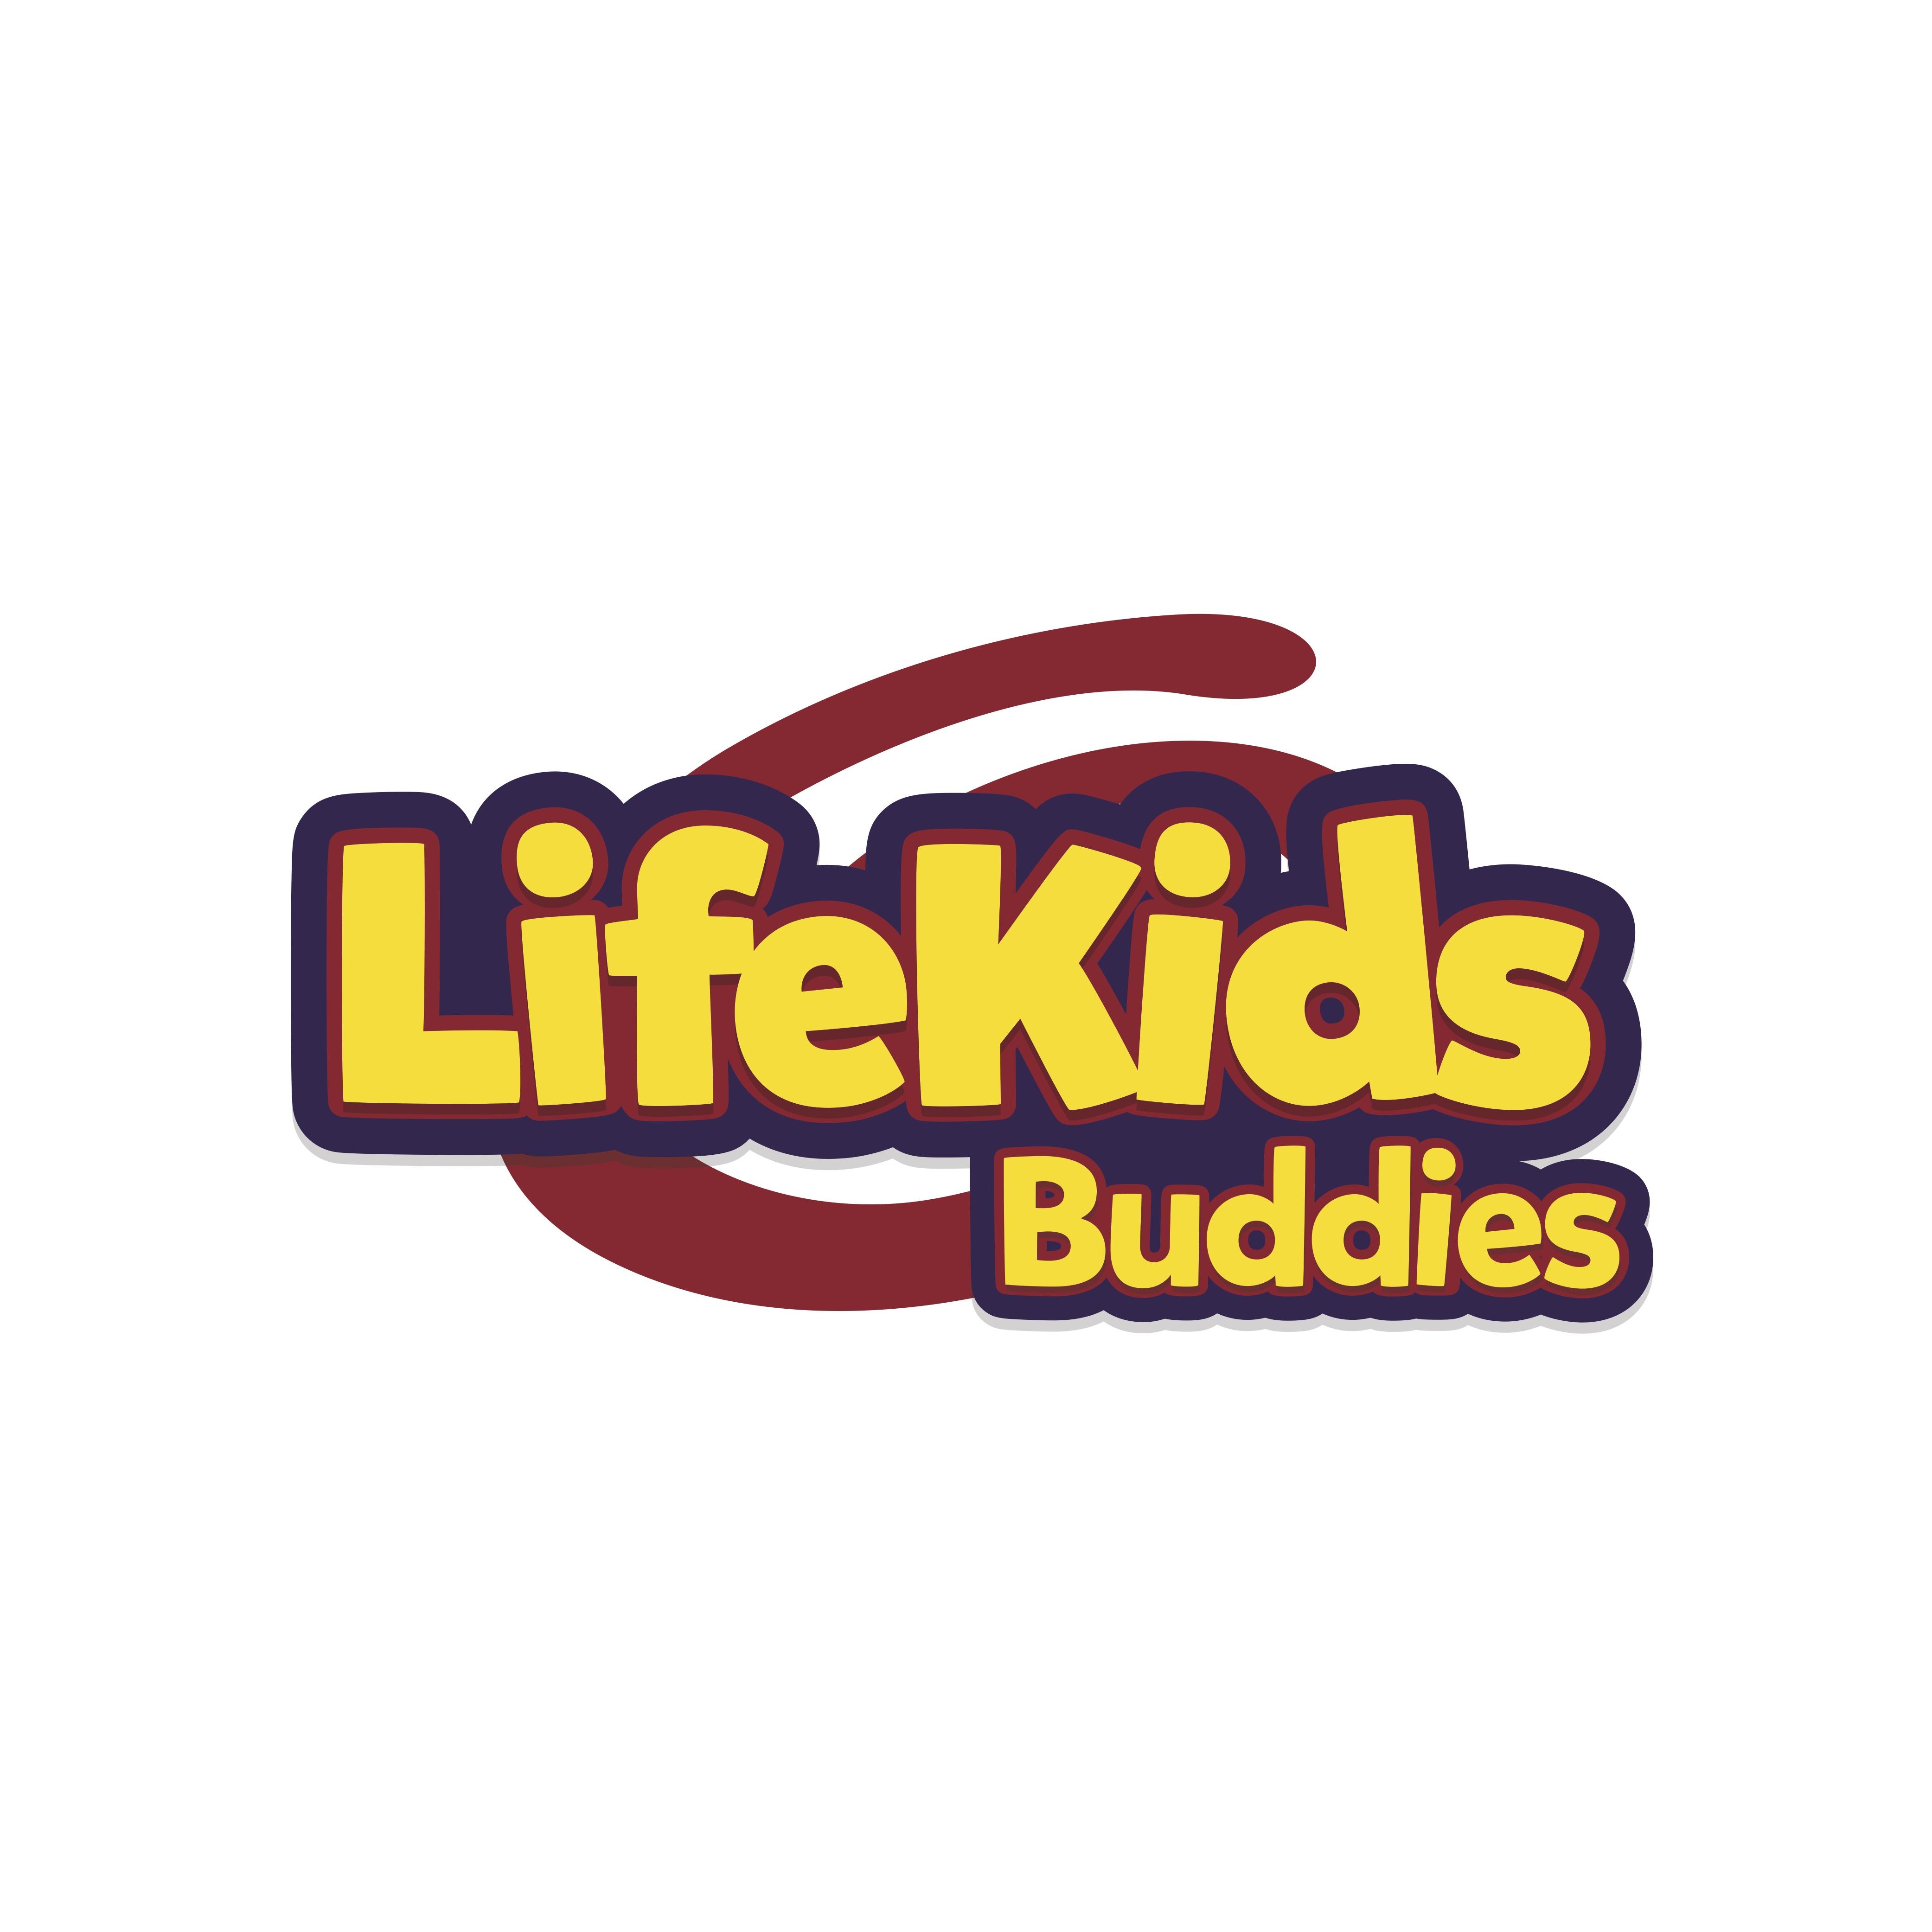 LifeKids Buddy Program